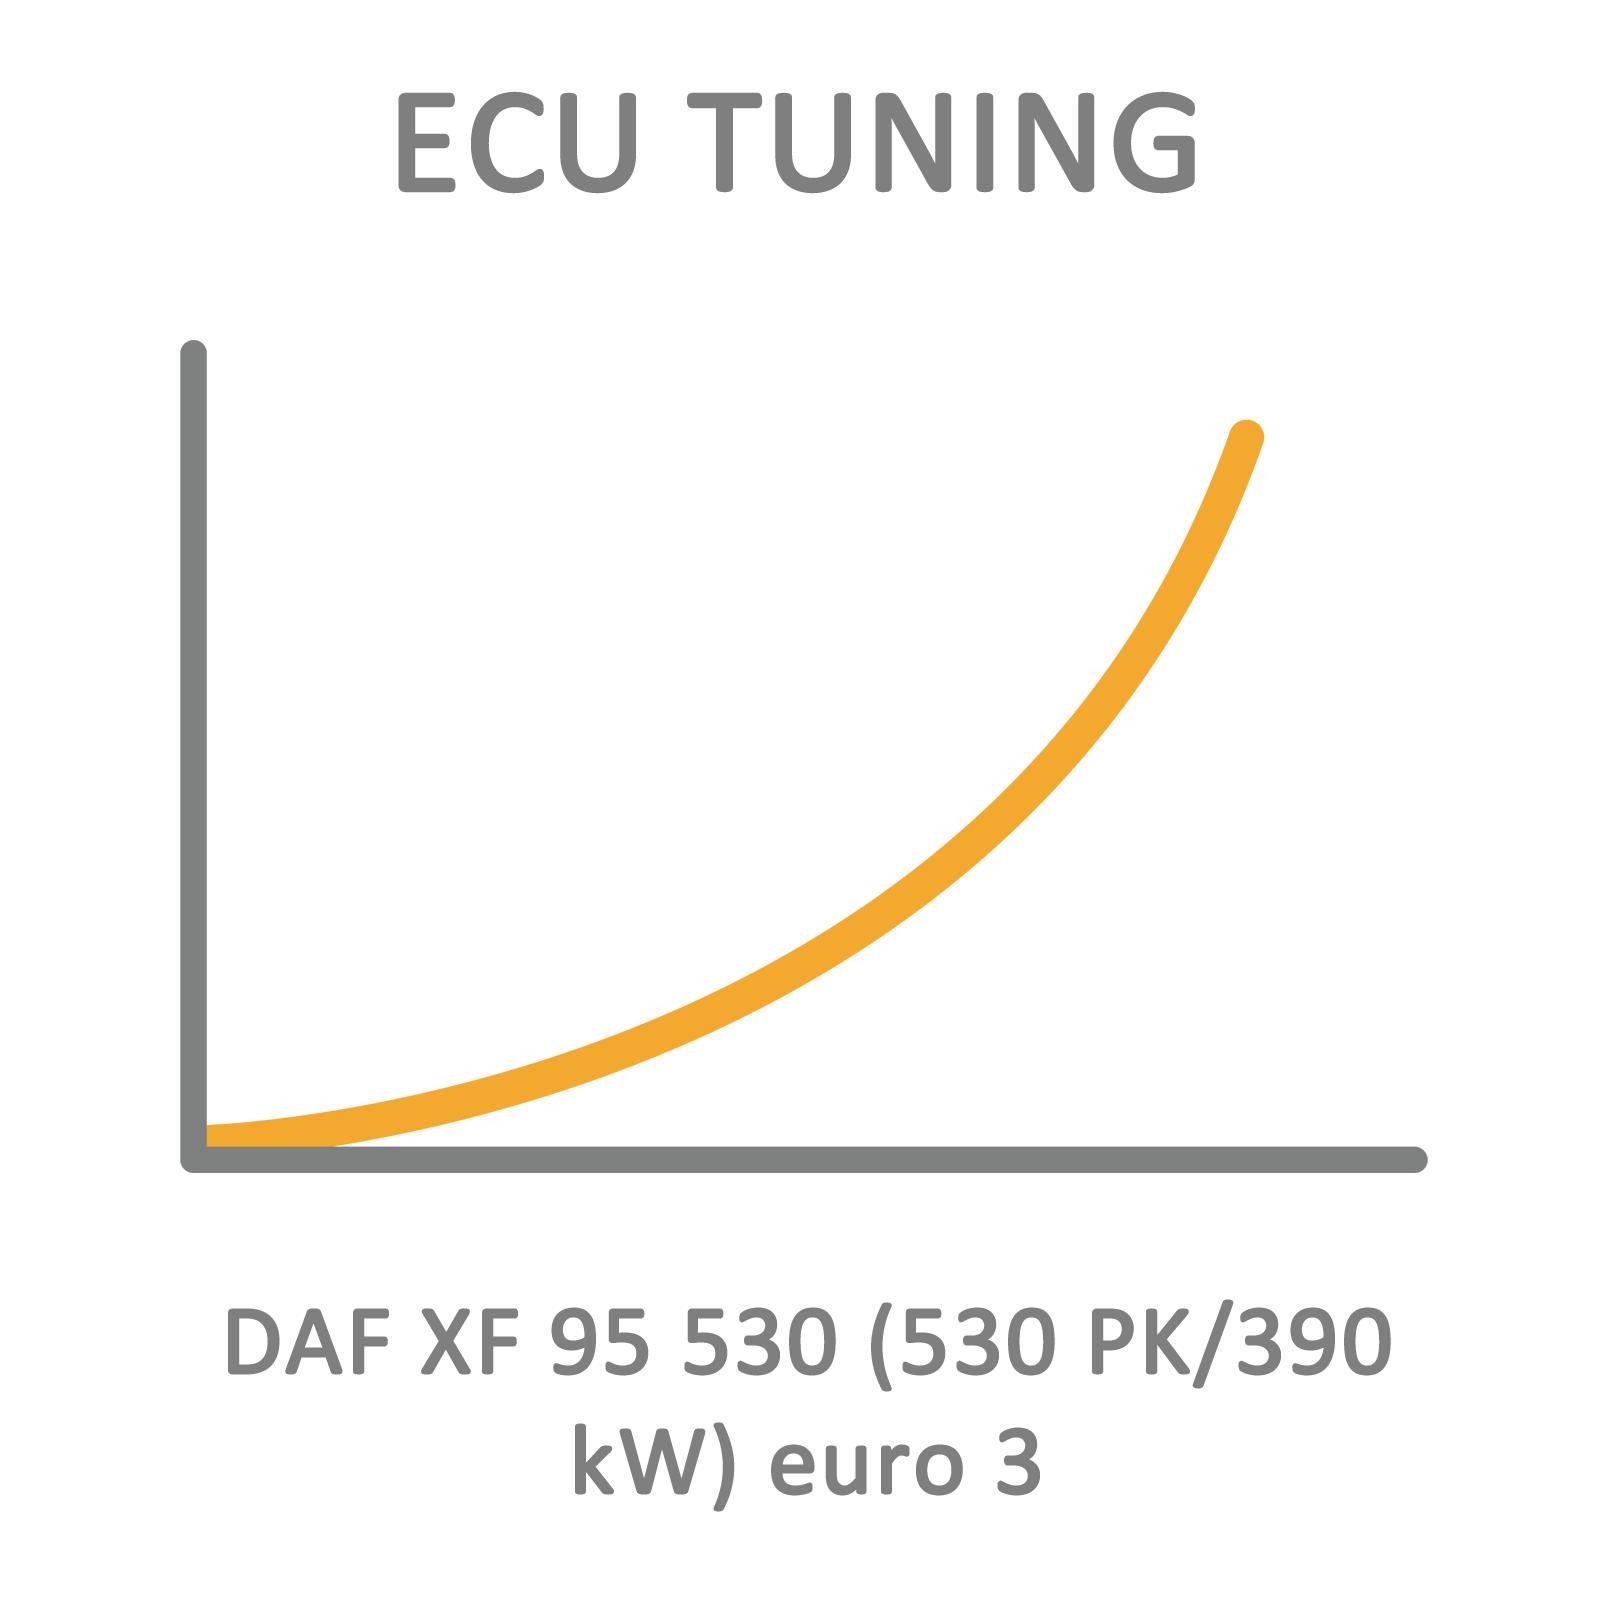 DAF XF 95 530 (530 PK/390 kW) euro 3 ECU Tuning Remapping